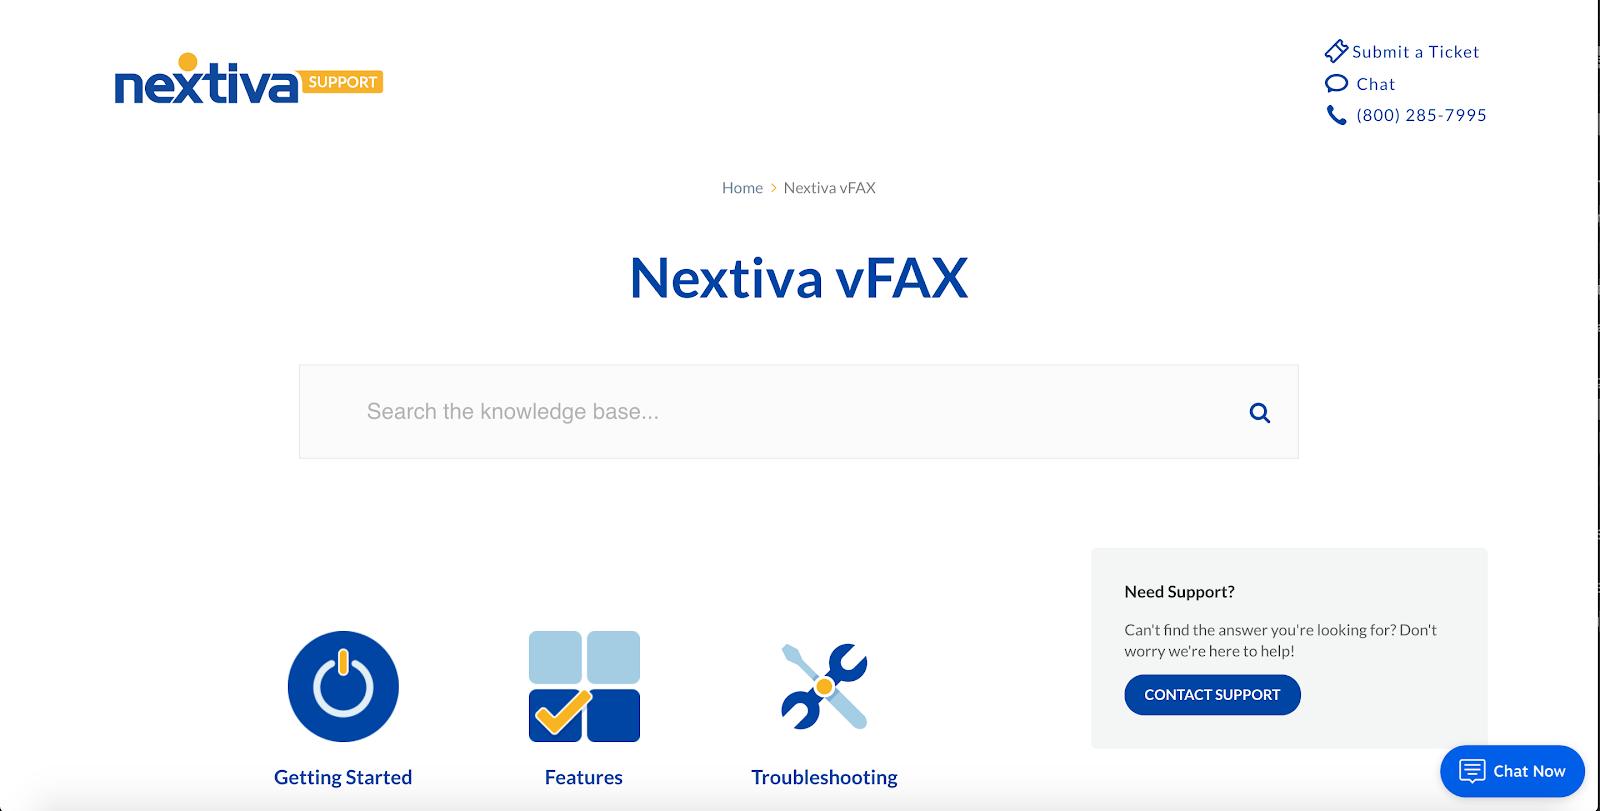 nextiva-featured